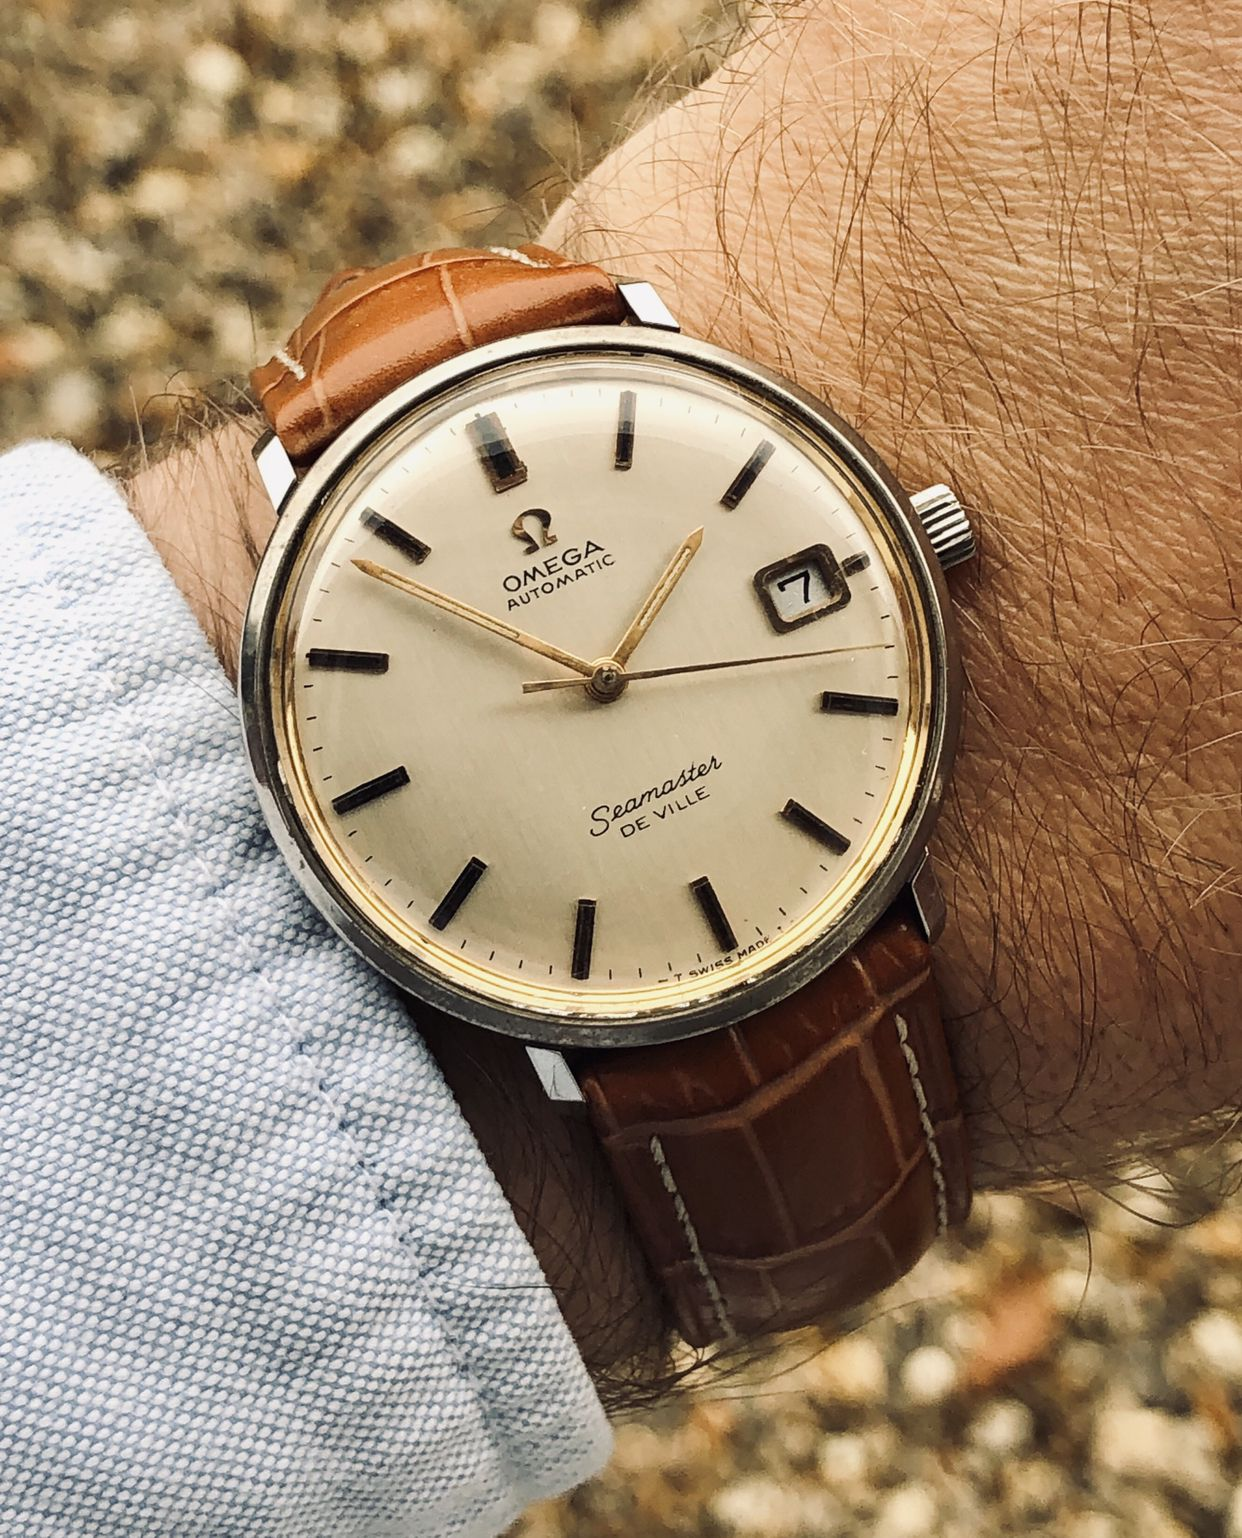 Omega Seamaster De Ville Automatic Men S Vintage Watch Herren Mode Uhr Mode